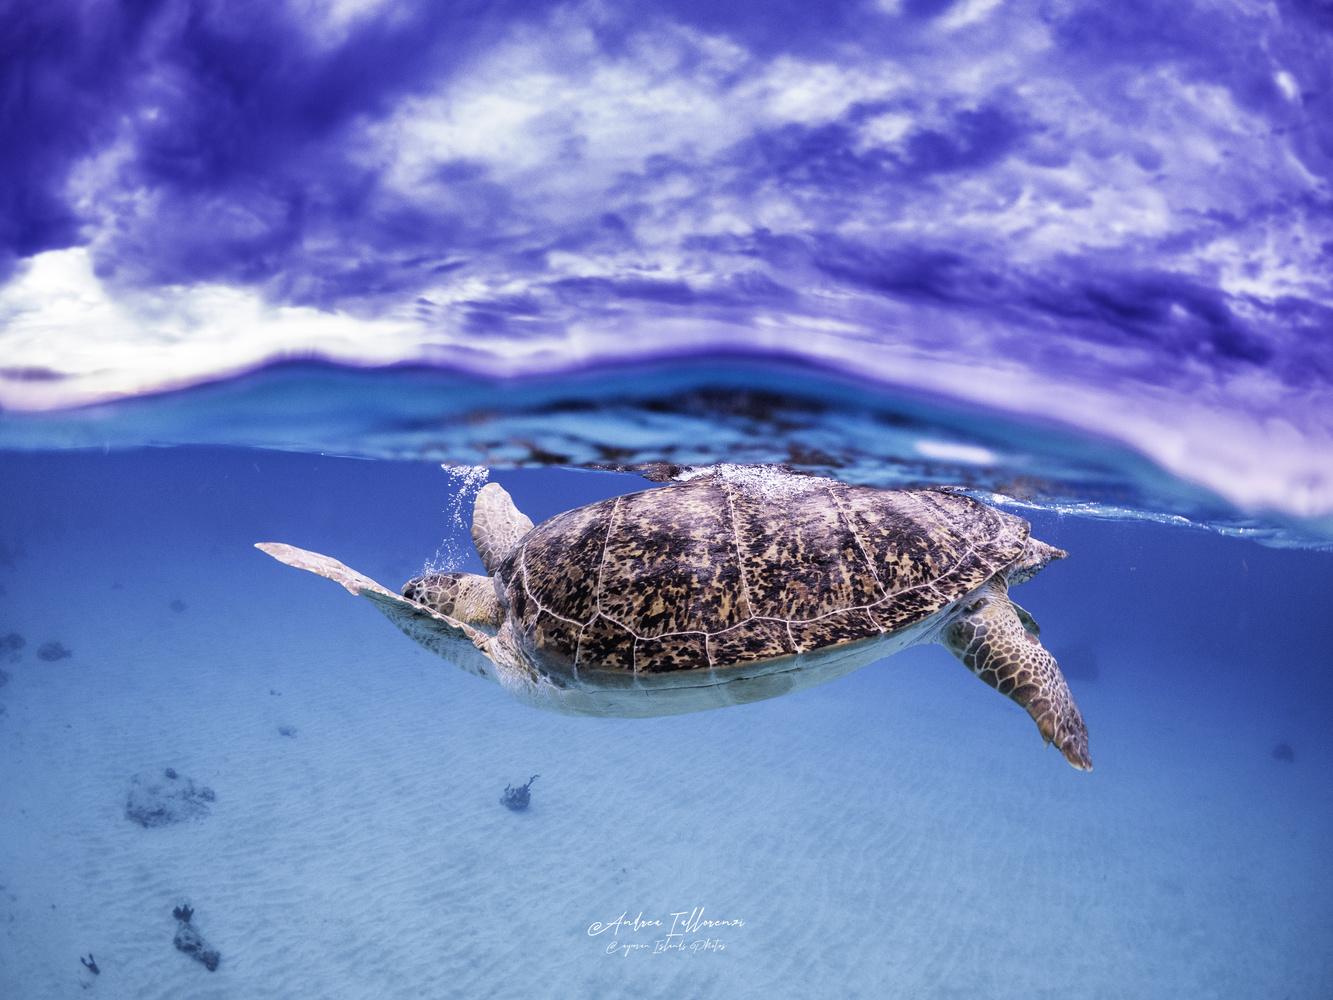 Green Turtle by andrea Iallorenzi